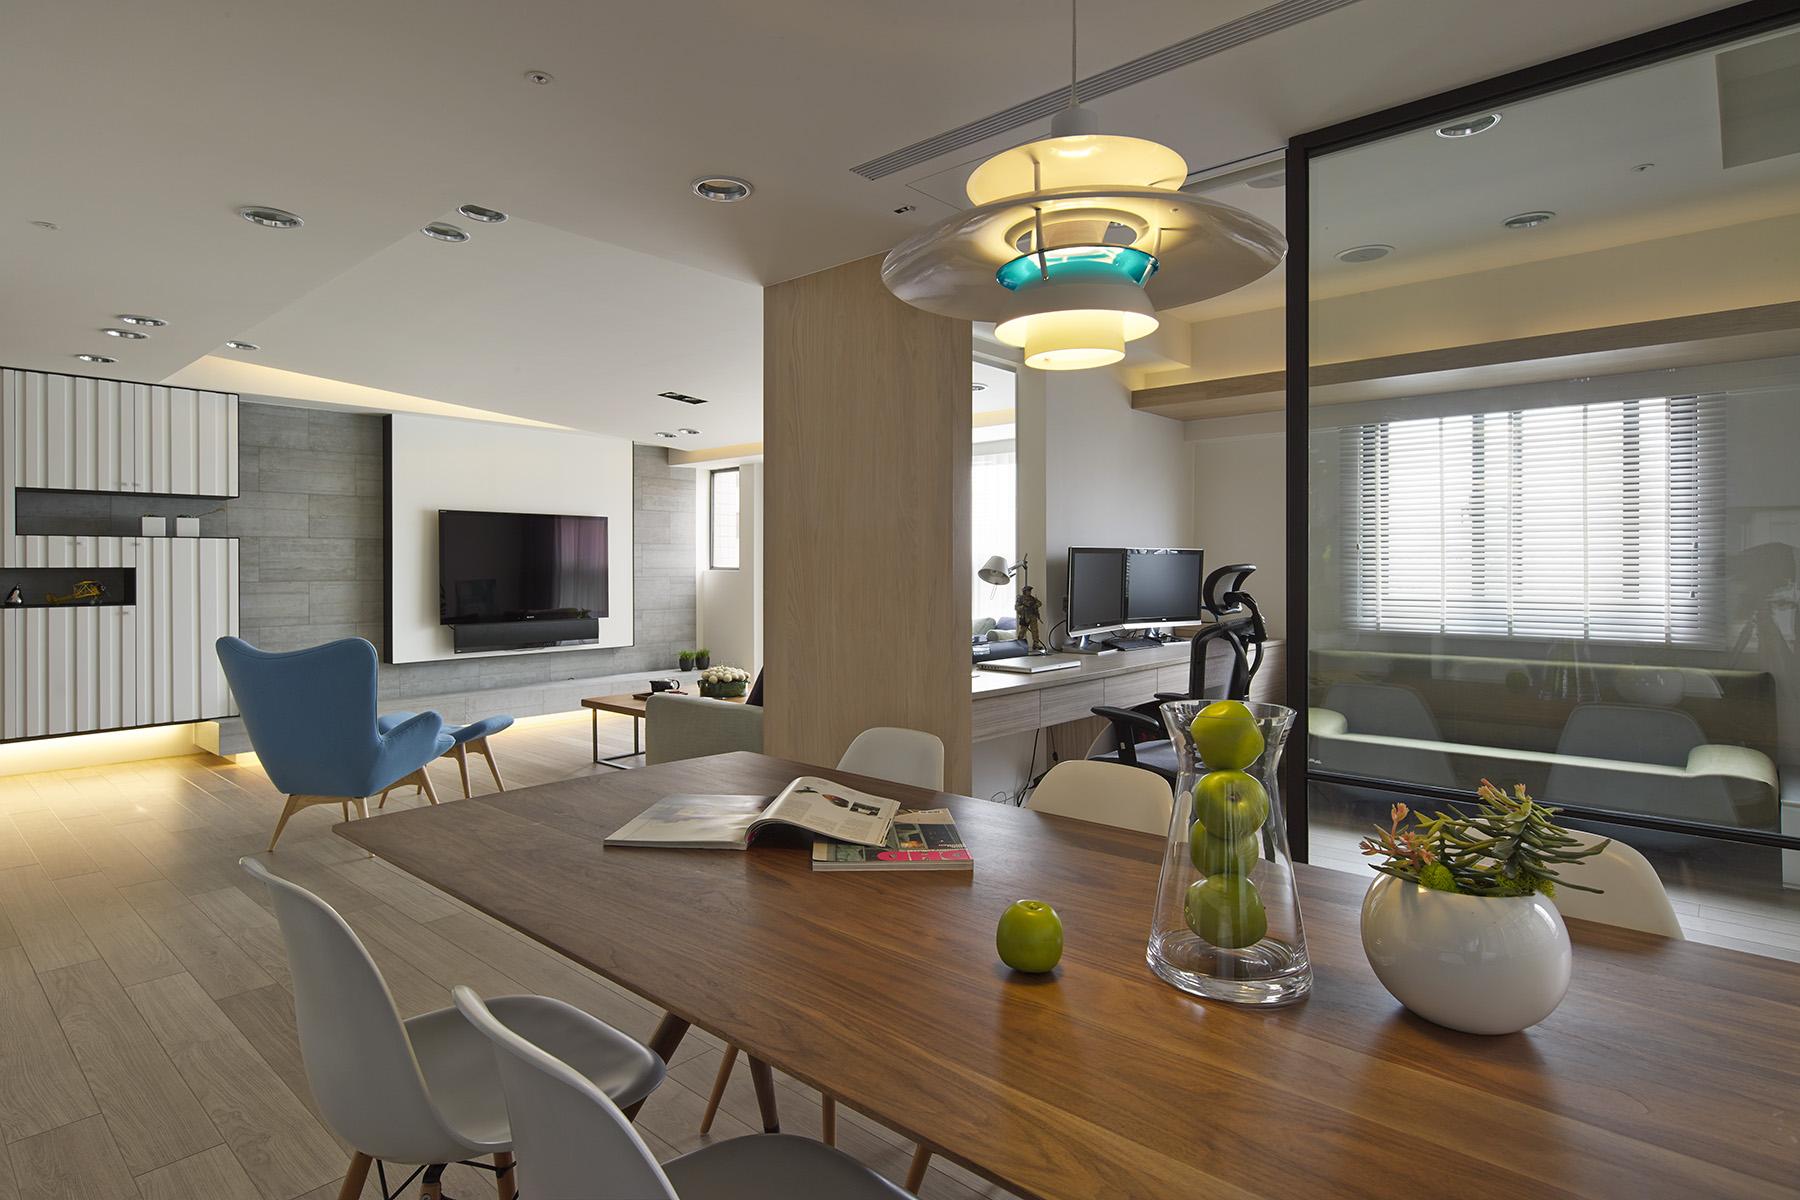 Living Room Furniture Kerala Designs living room furniture kerala designs   modern dining chairs usa